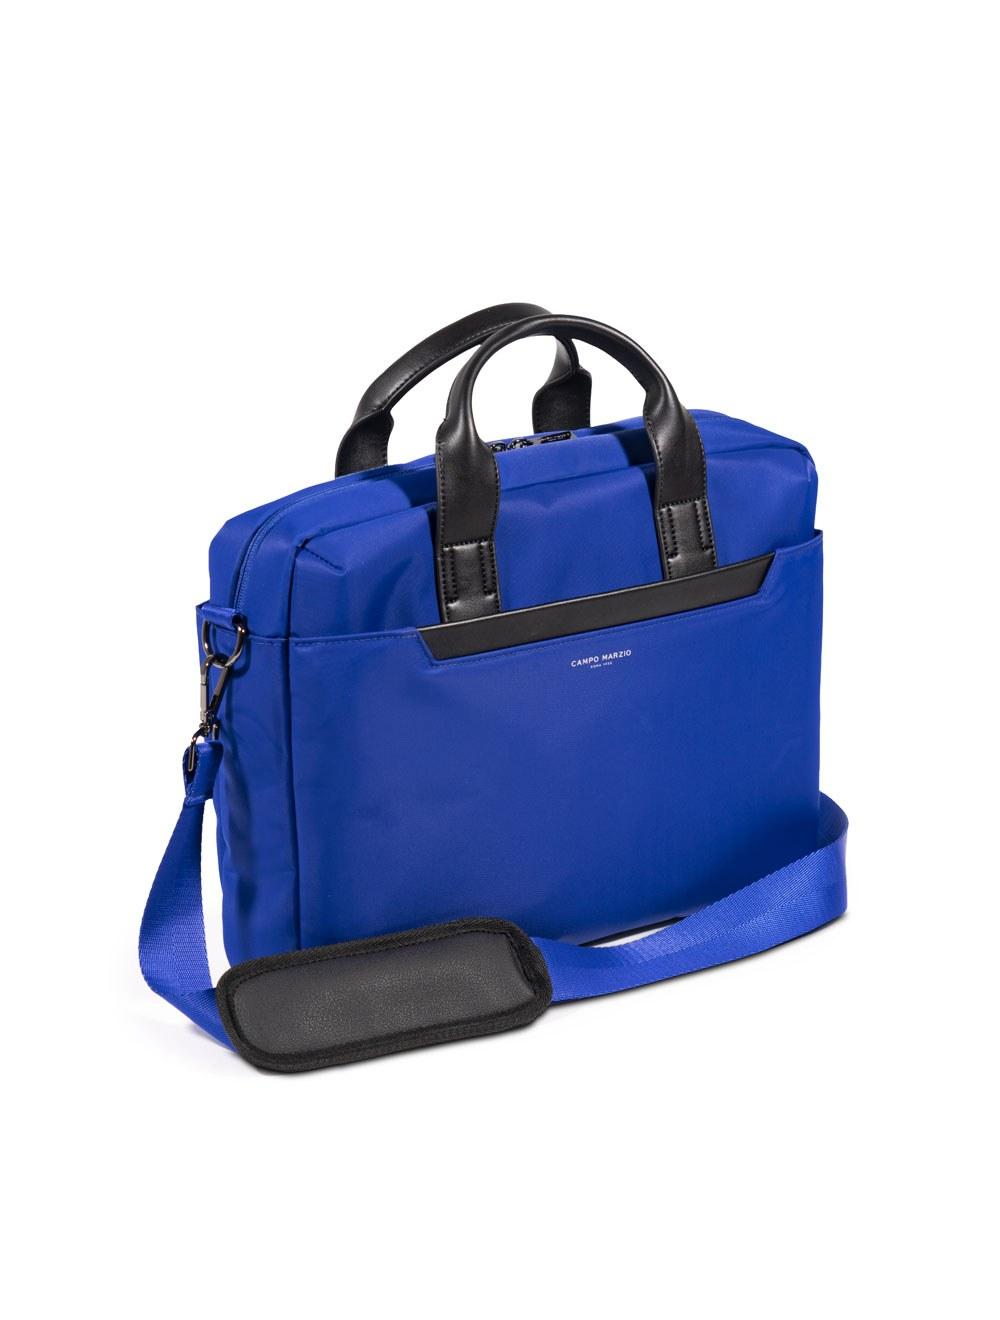 "Laptop Holder 13"" - Blueberry"